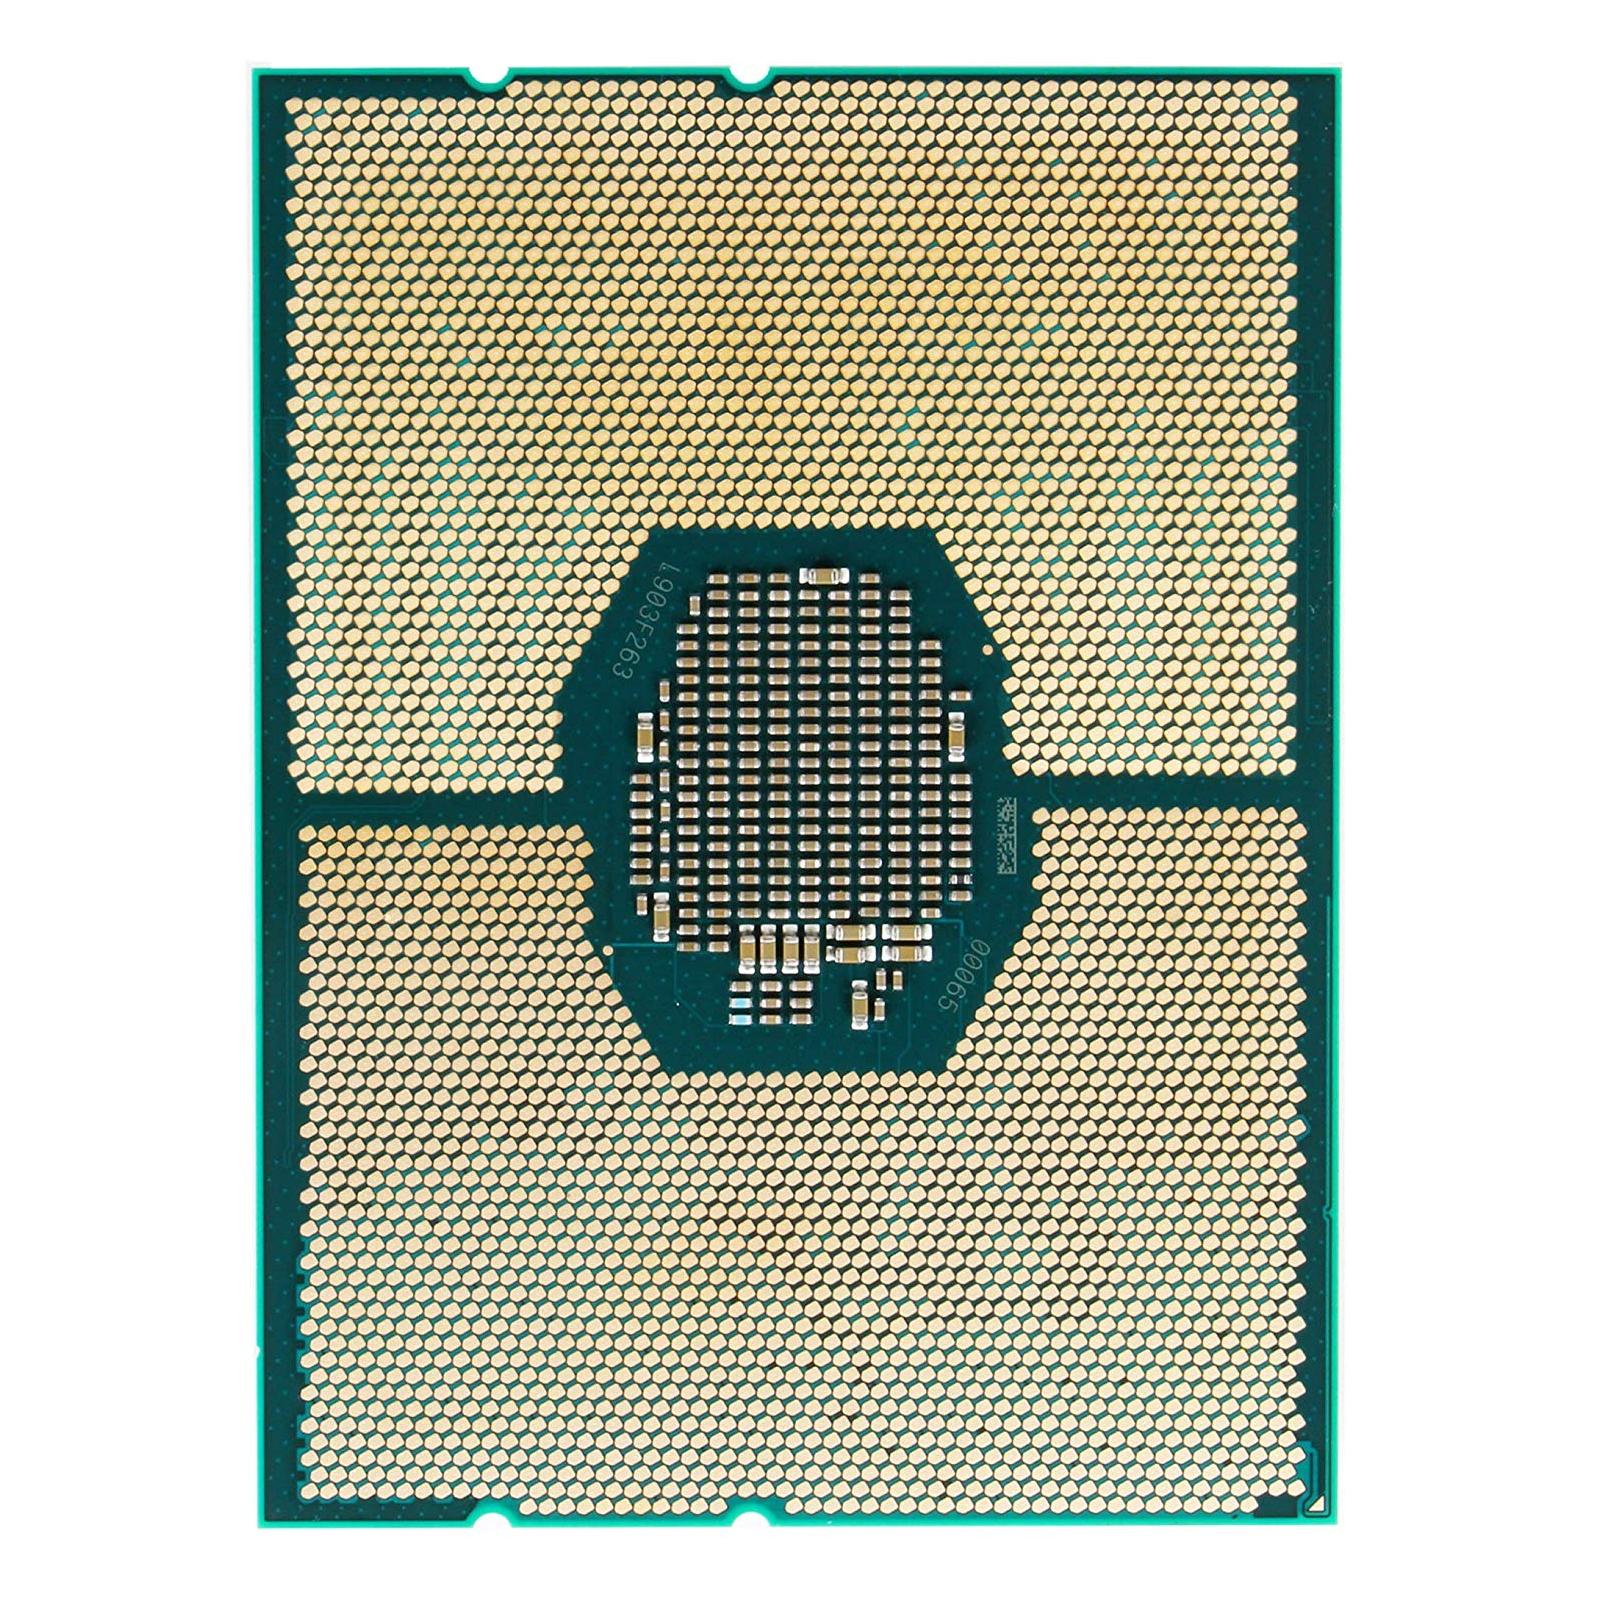 Процессор серверный Supermicro Xeon Silver 4214 12C/24T/2.20GHz/16.5MB/FCLGA3647 (P4X-CLX4214-SRFB9) изображение 2